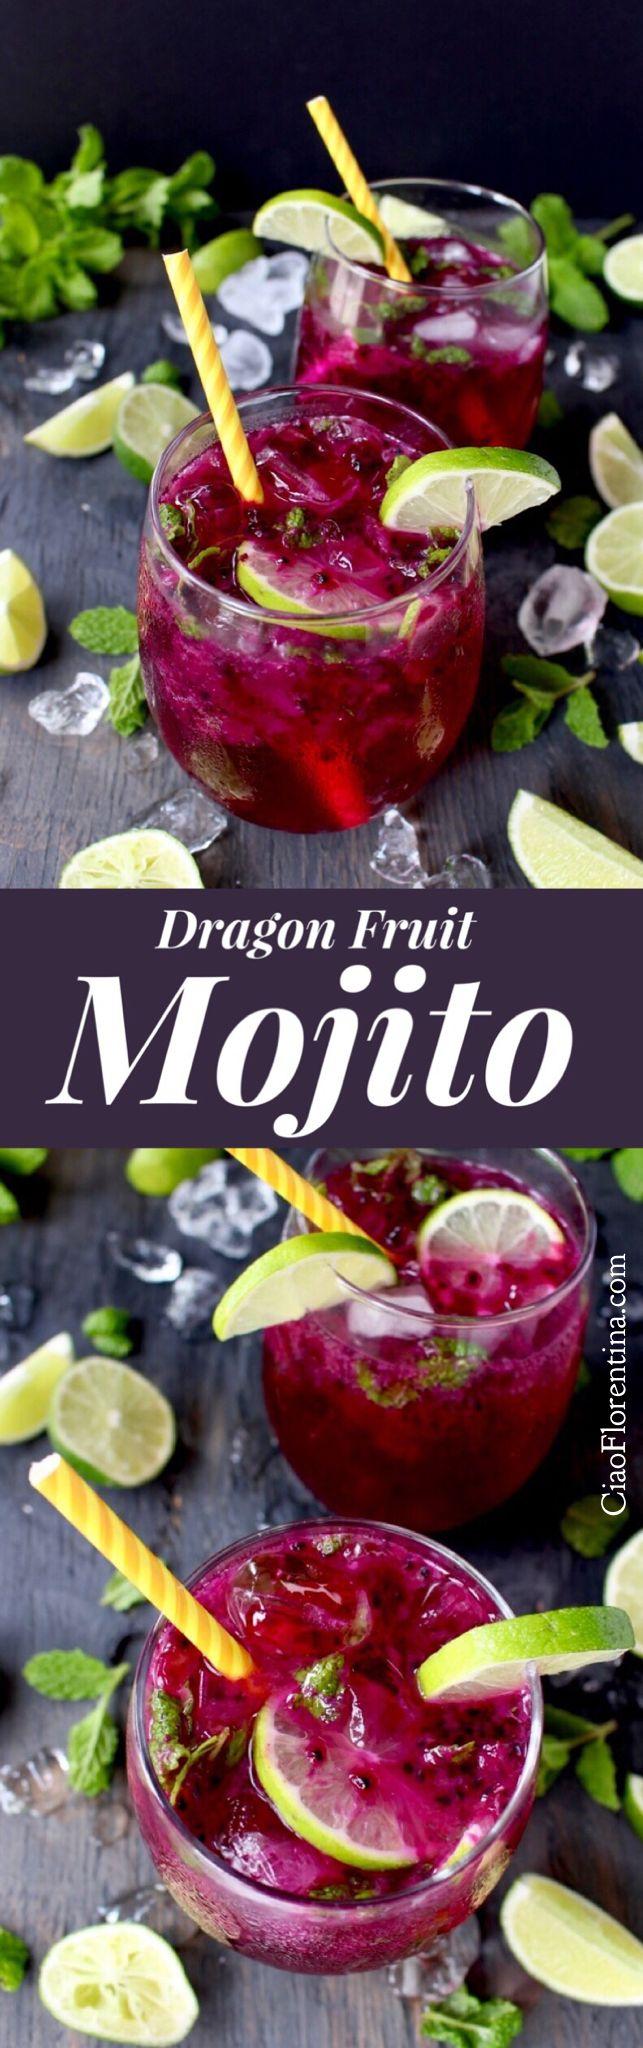 Dragon Fruit Mojito Recipe with Mint and Lime | CiaoFlorentina.com @CiaoFlorentina